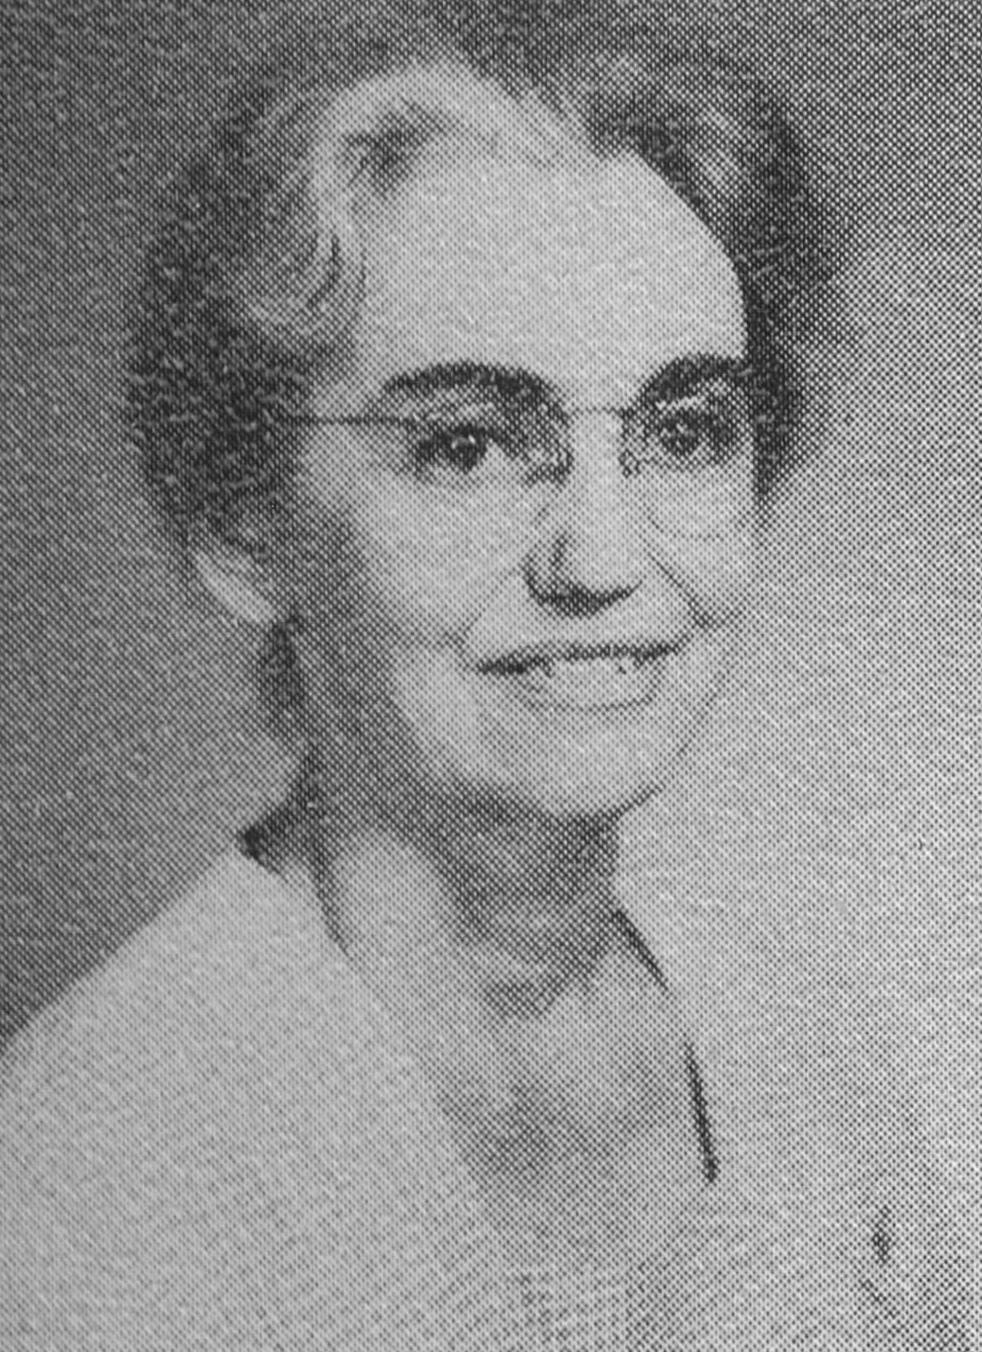 Dorothy Burrow